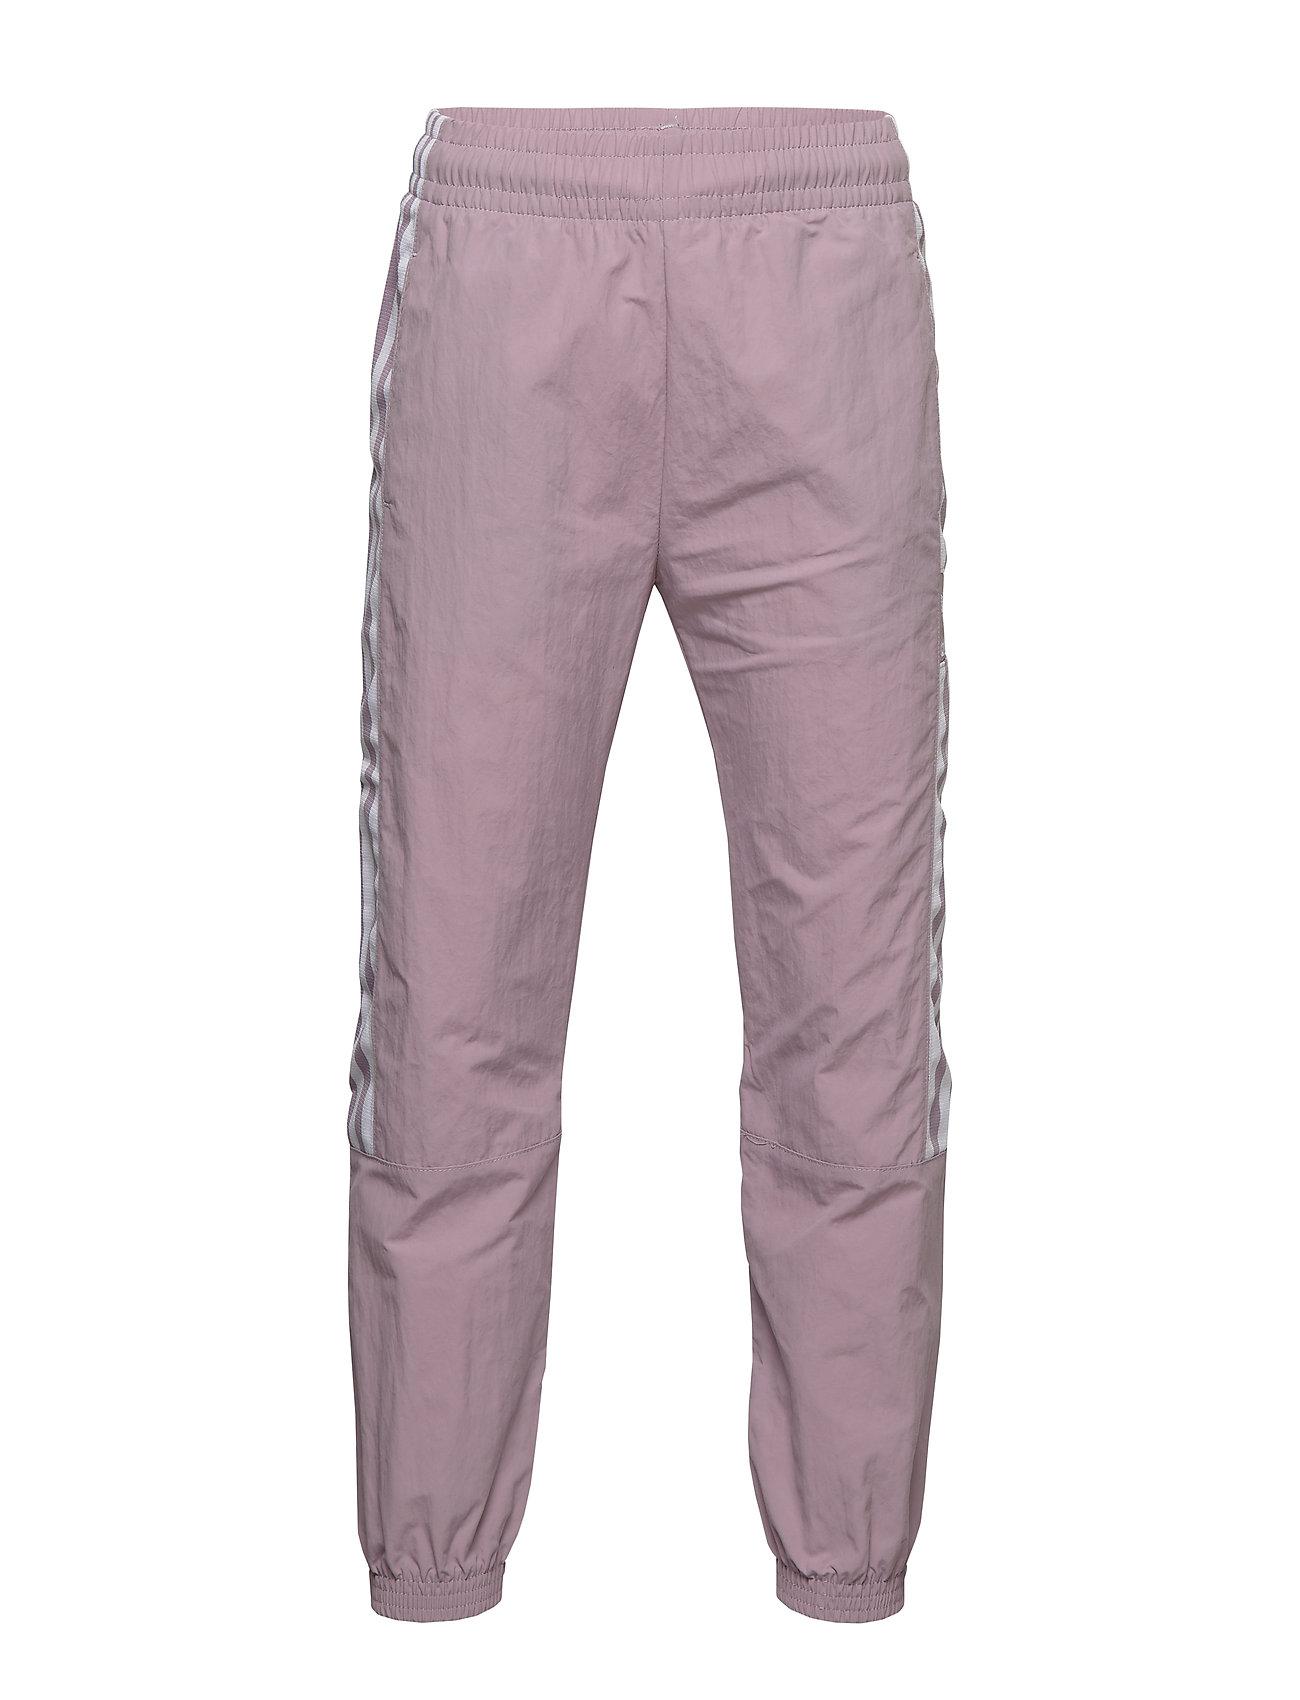 adidas Originals NEW ICON TP - SOFVIS/WHITE